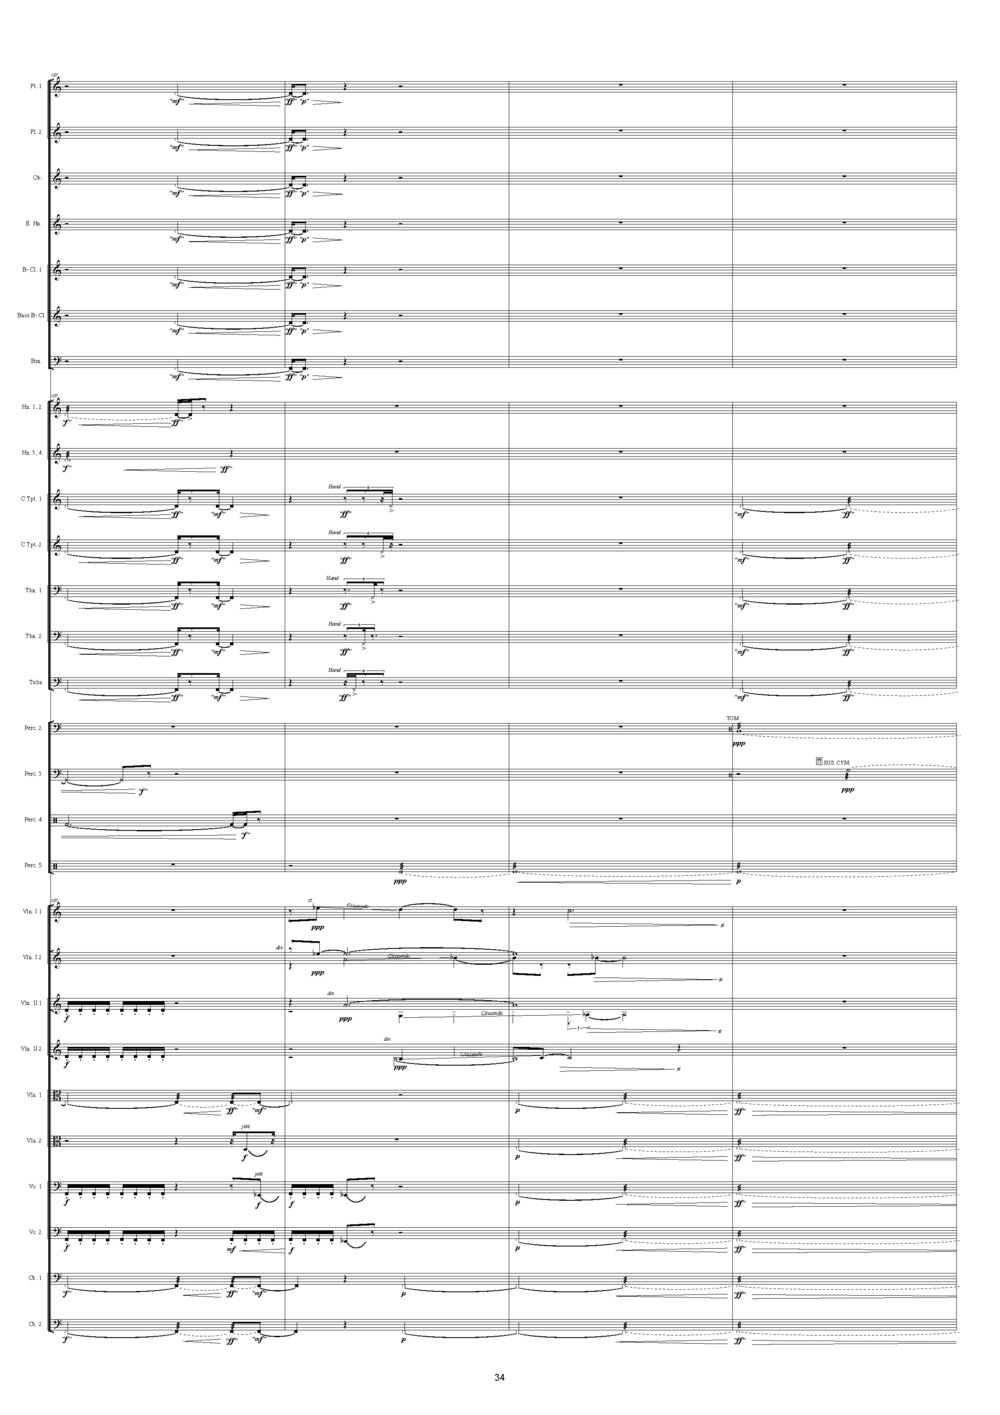 METANOIA_2009-RAPPOPORT_Seite_34.jpg